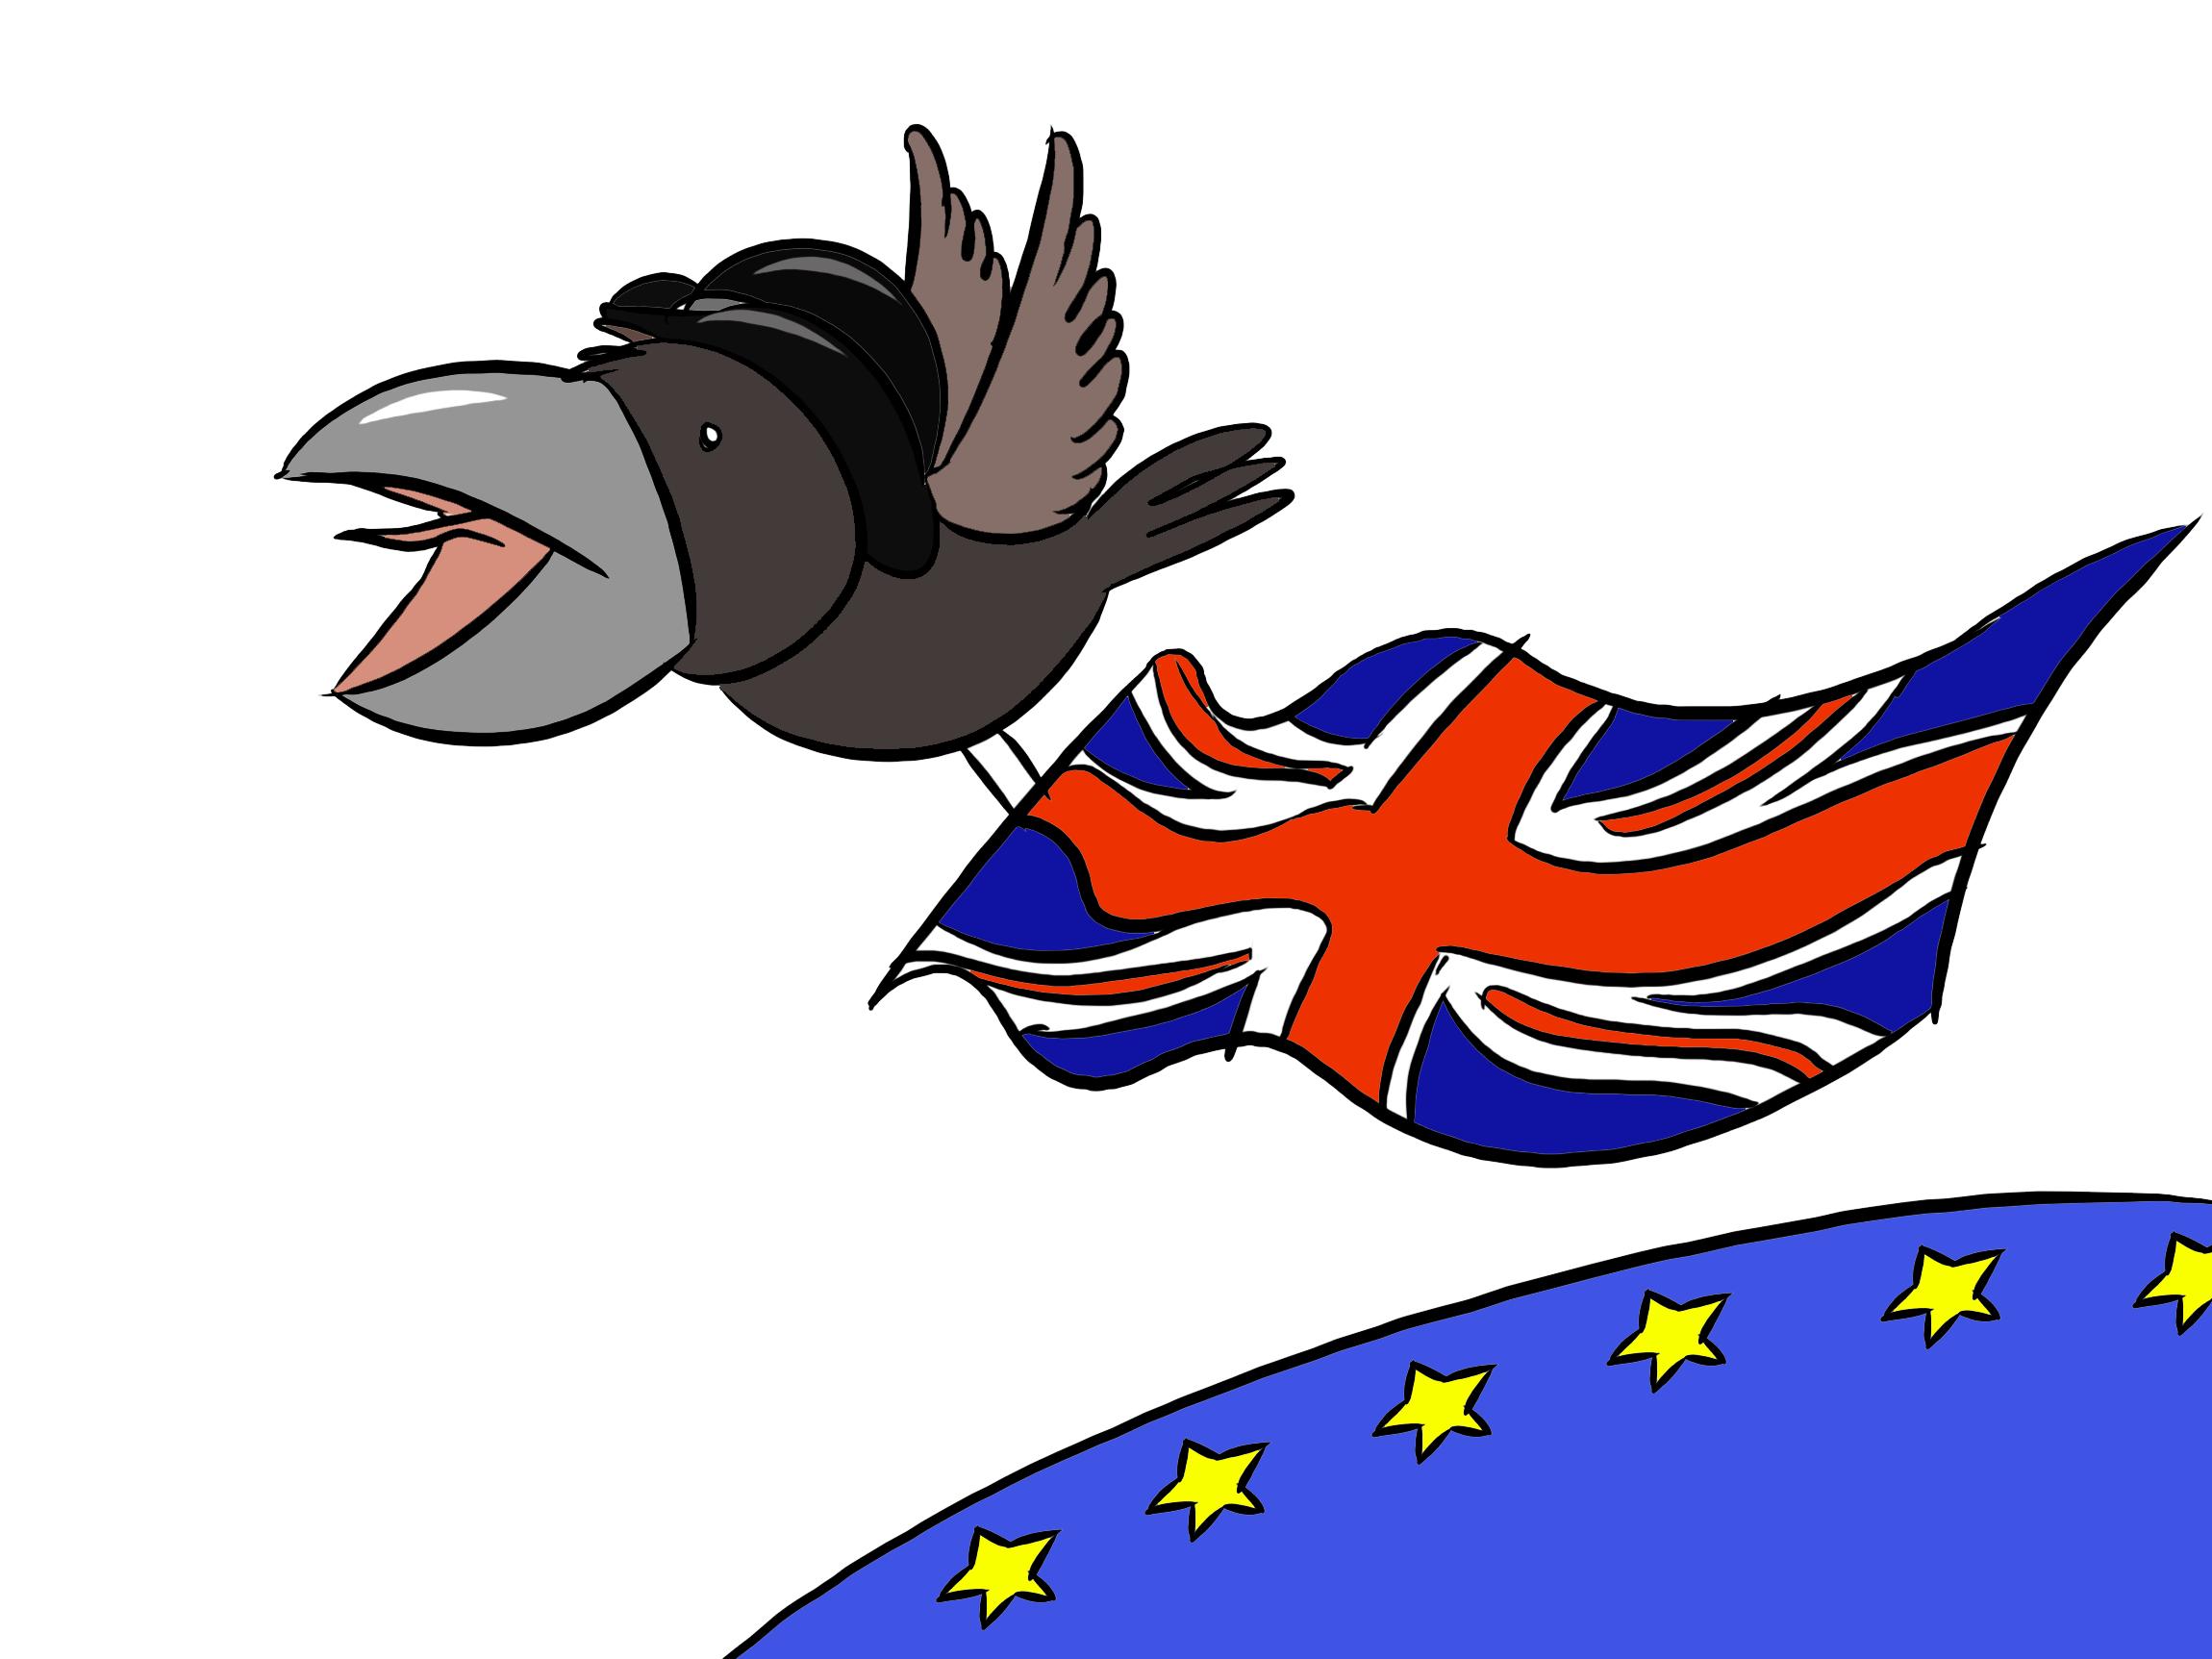 Brexit kostenloses Bild, Clipart